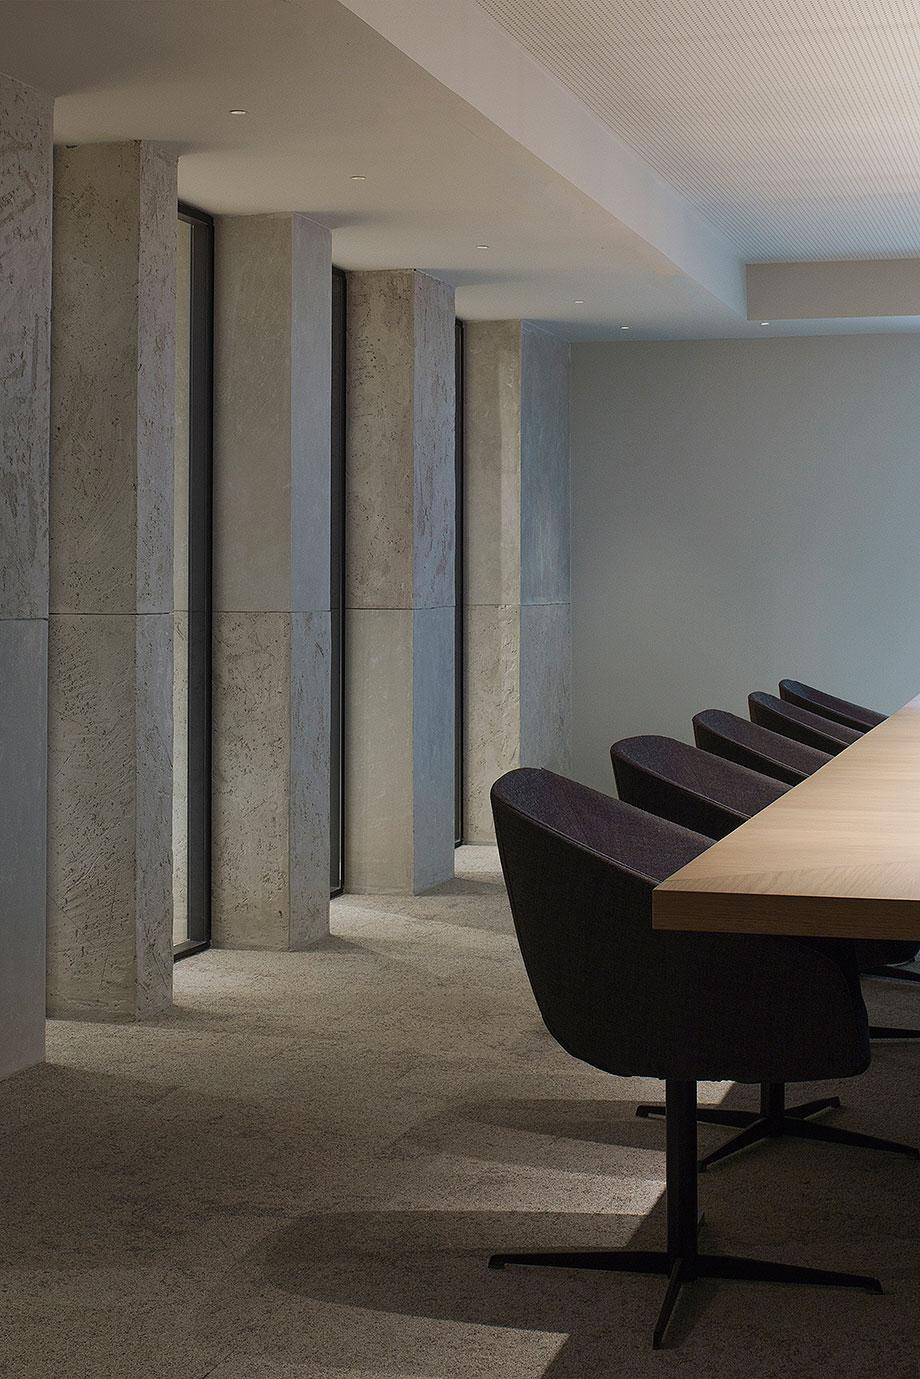 oficinas en madrid azora por francesc rife (17) - foto david zarzoso